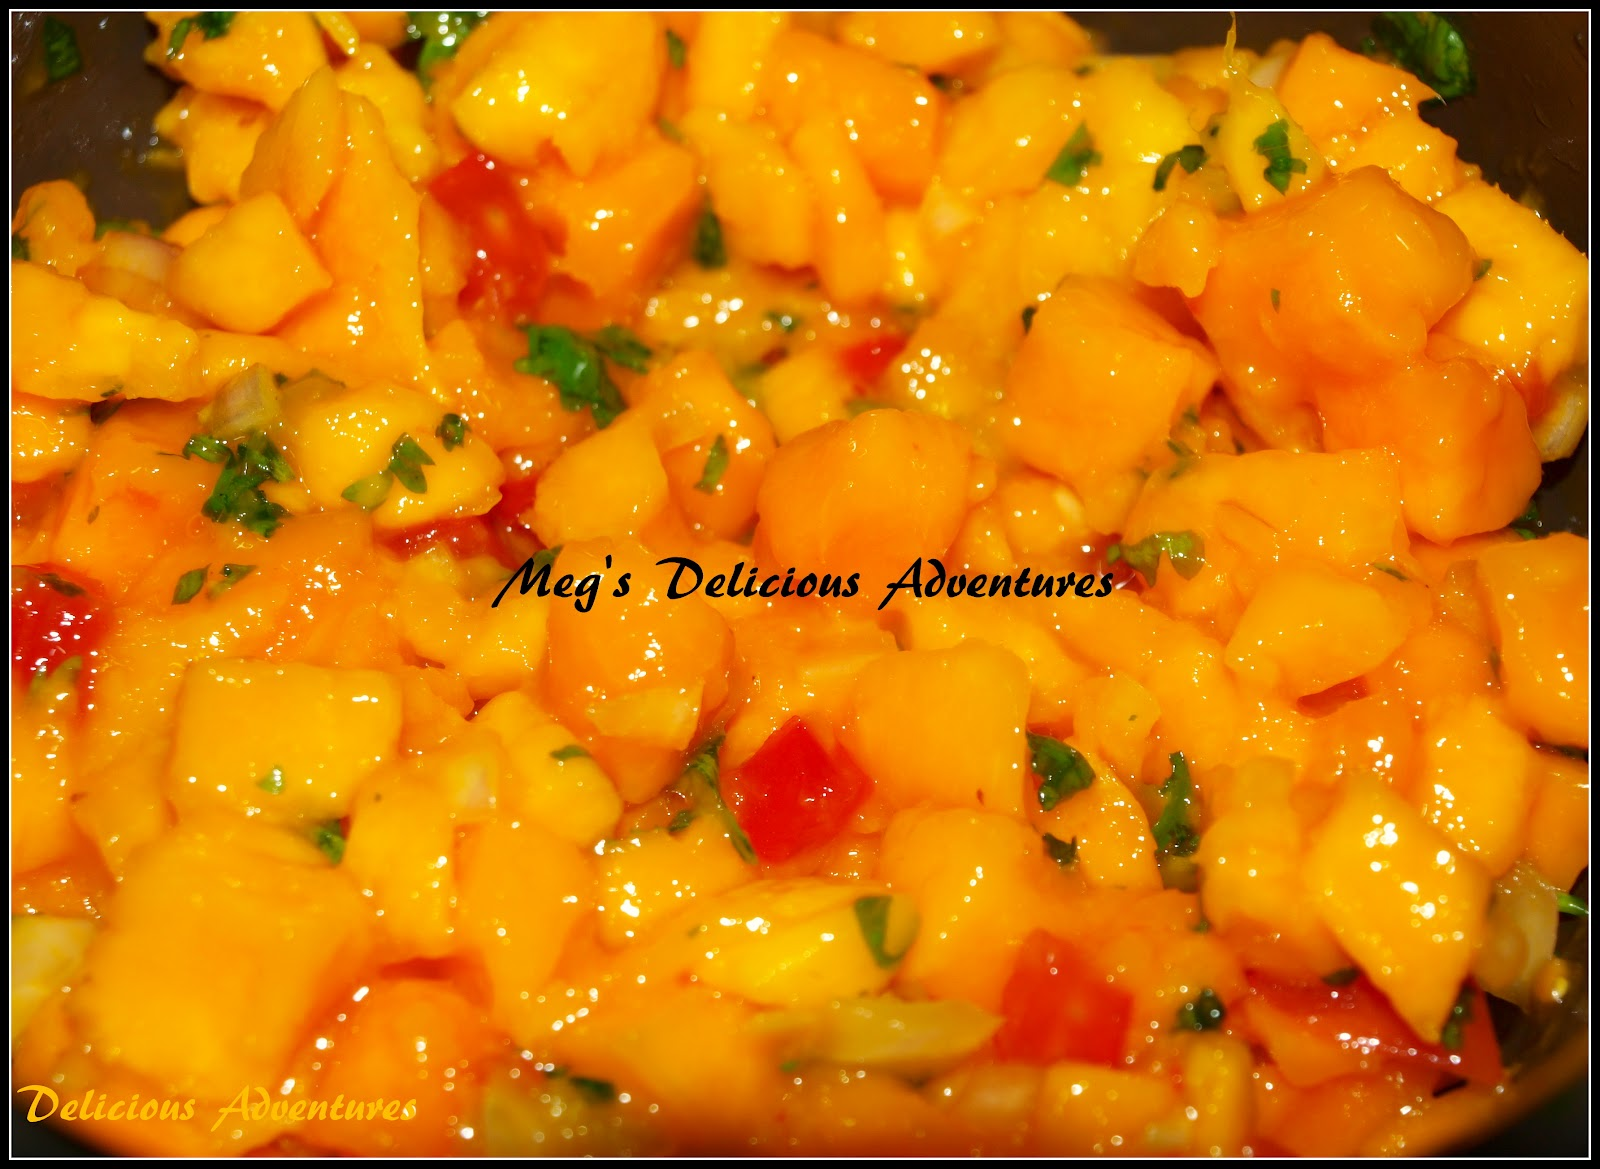 mango salsa mango salsa recipe 2 mangoes ripe 1 2 tomato 1 2 onion ...